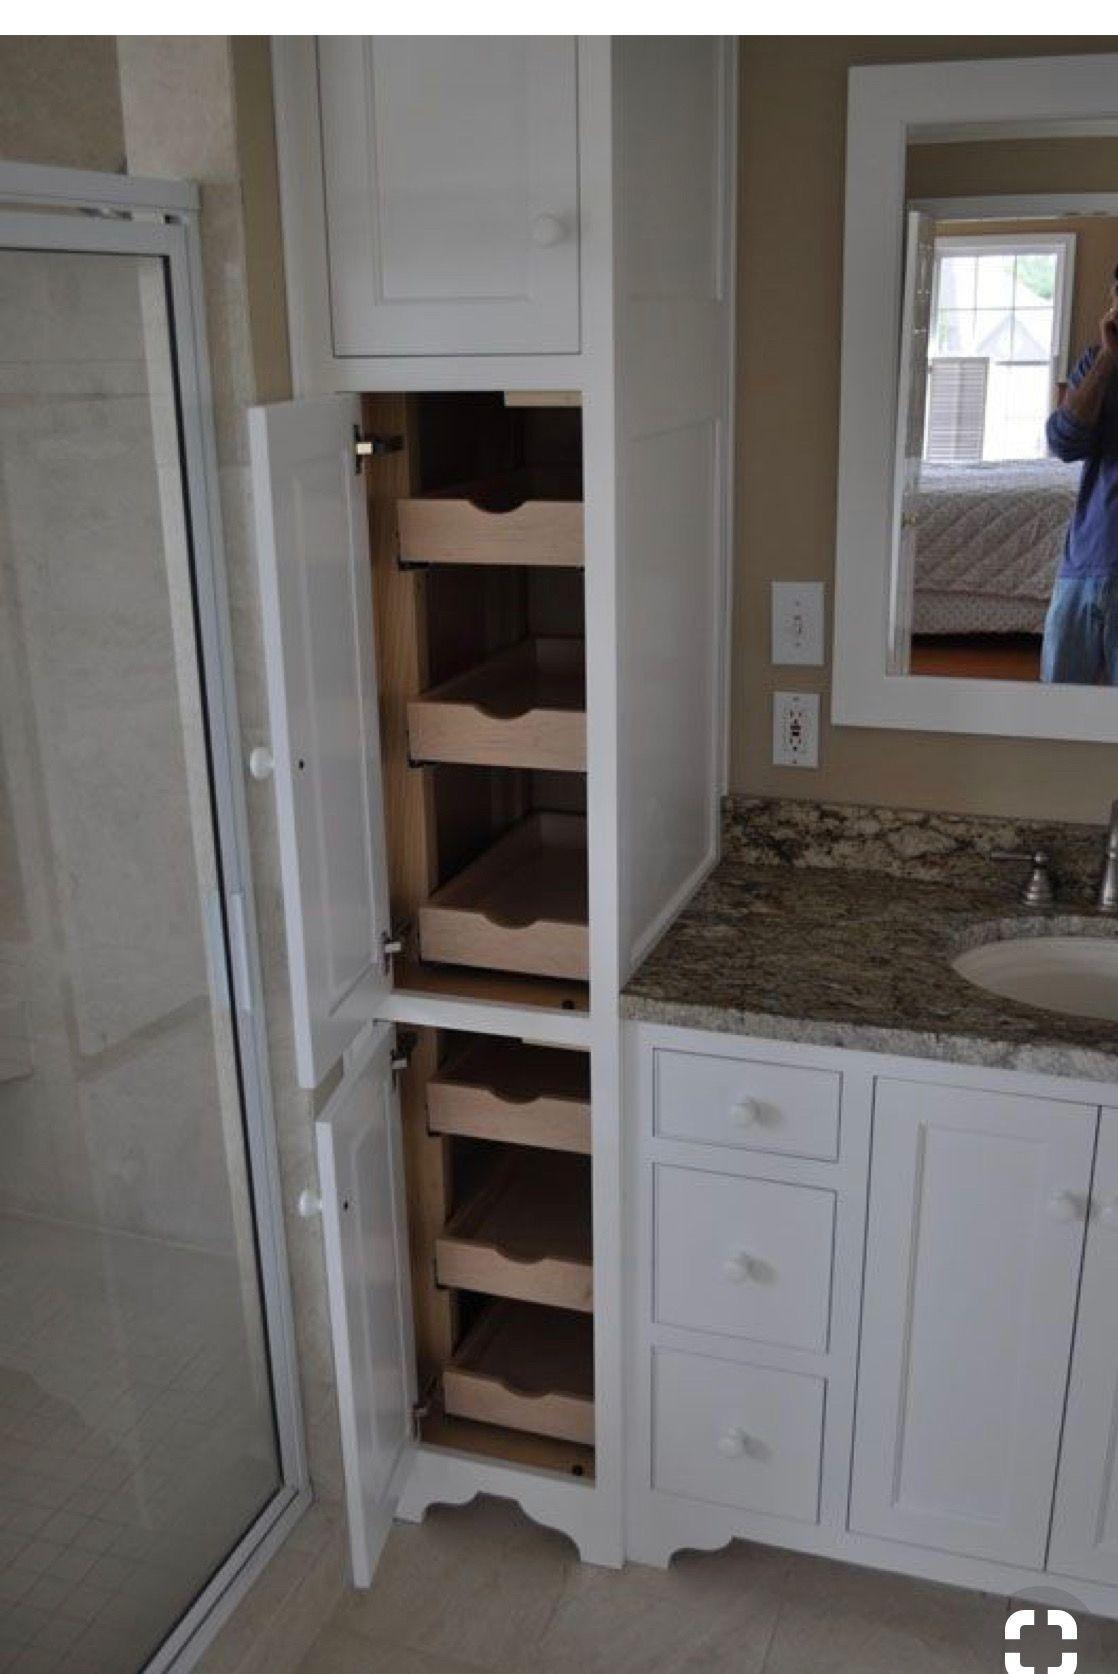 Bathroom Linen Tower Ideas On Foter